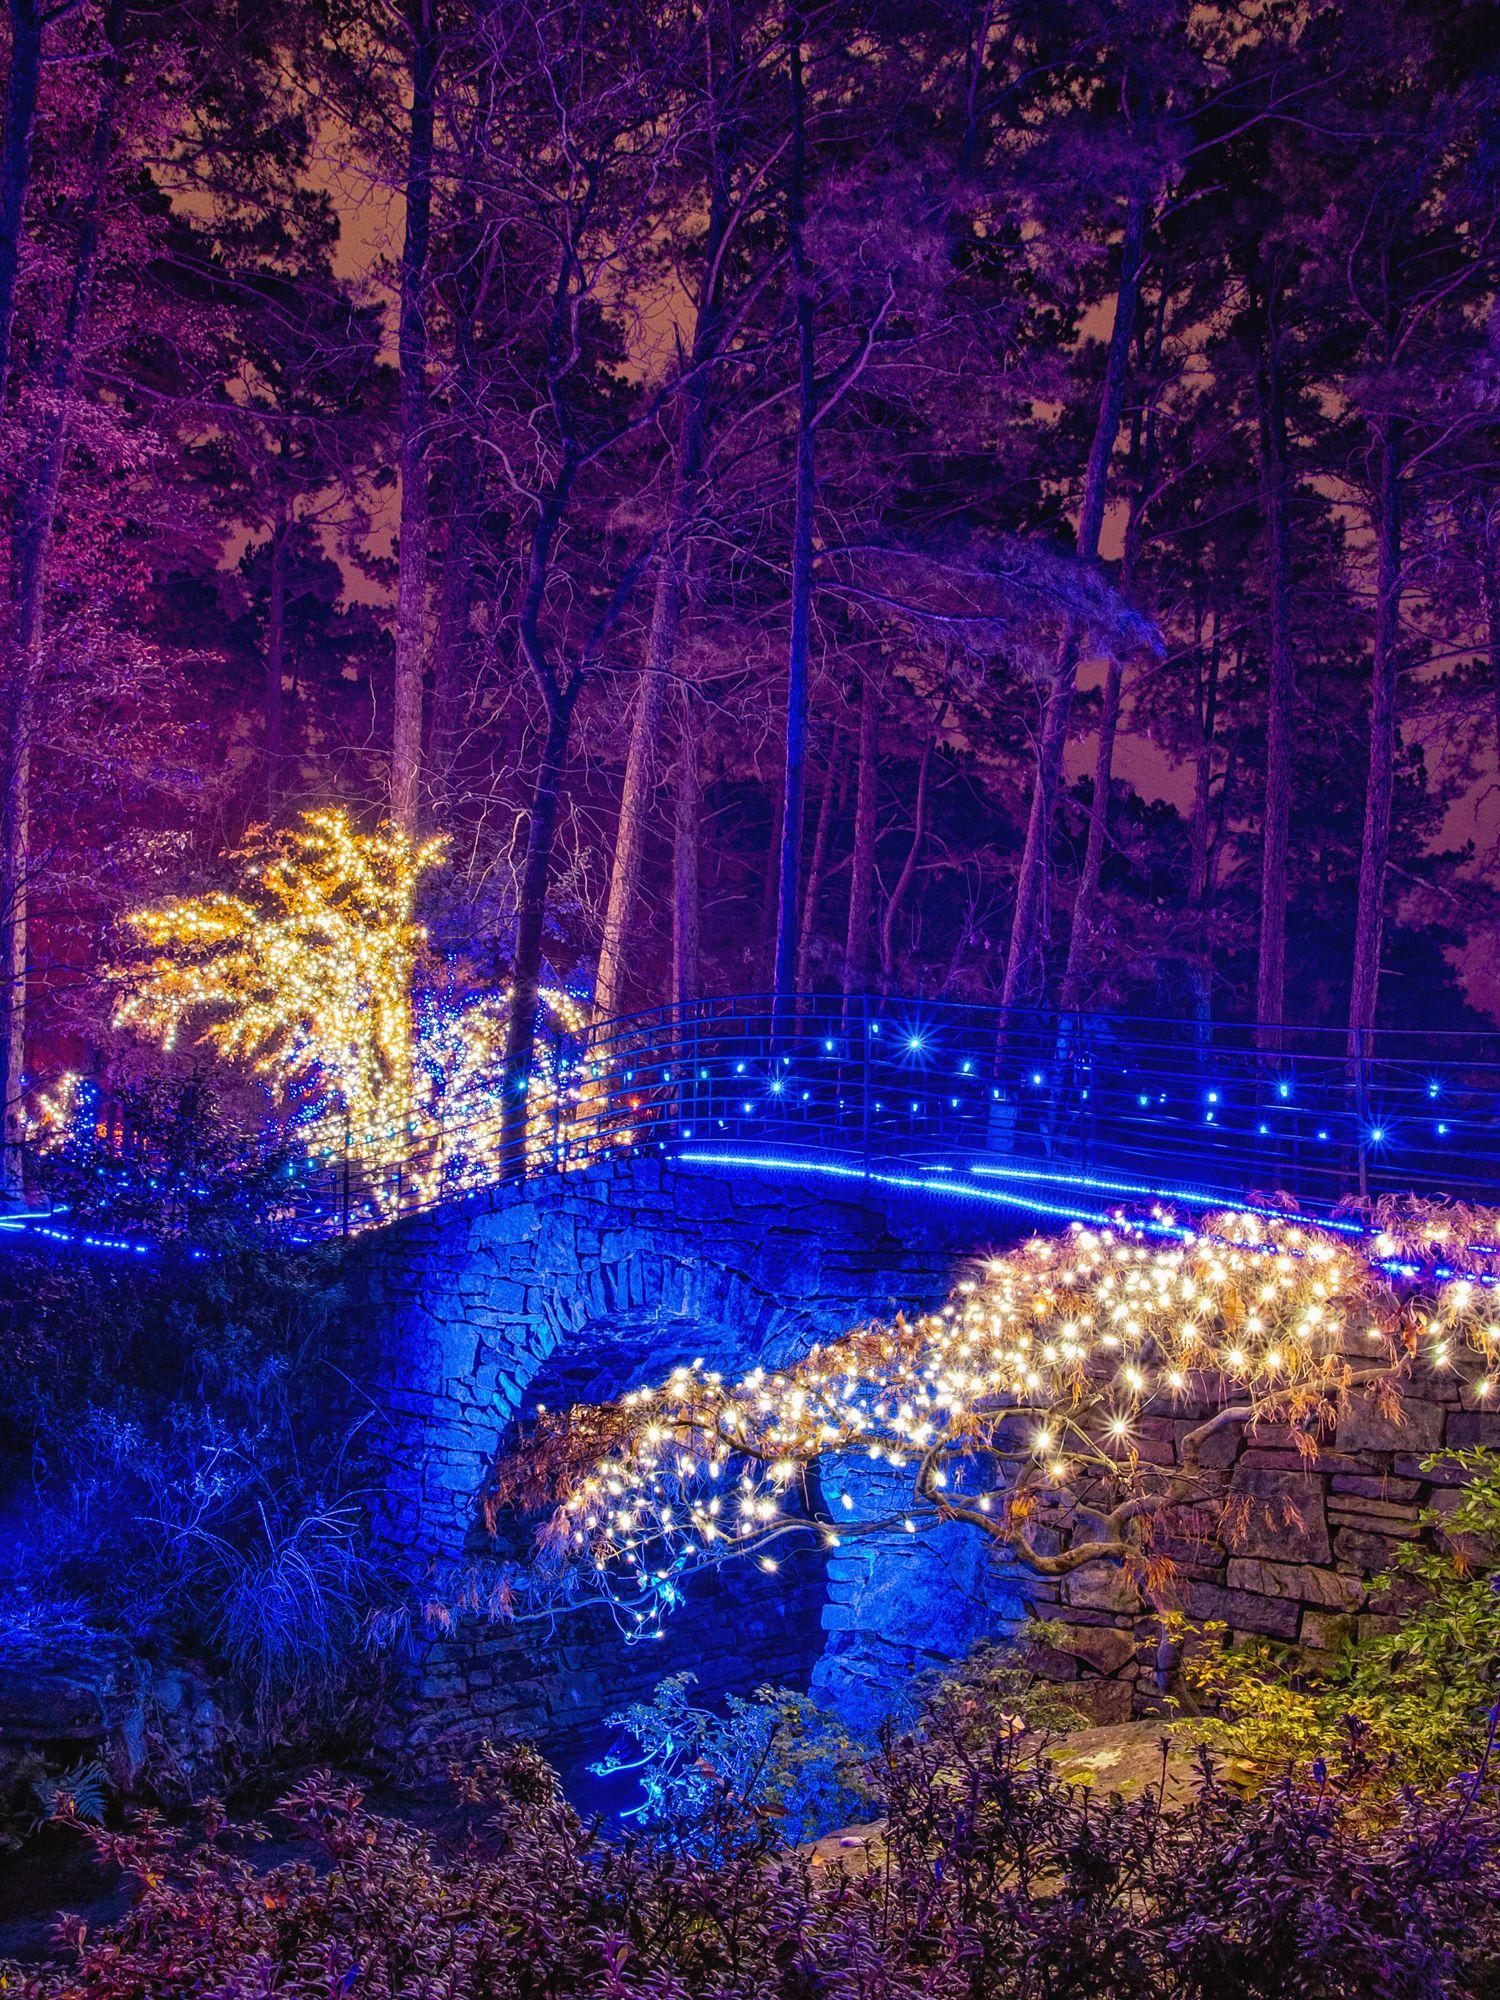 75388c2f03424dac84cc18e0b74014ce - Garvan Gardens Hot Springs Christmas Lights